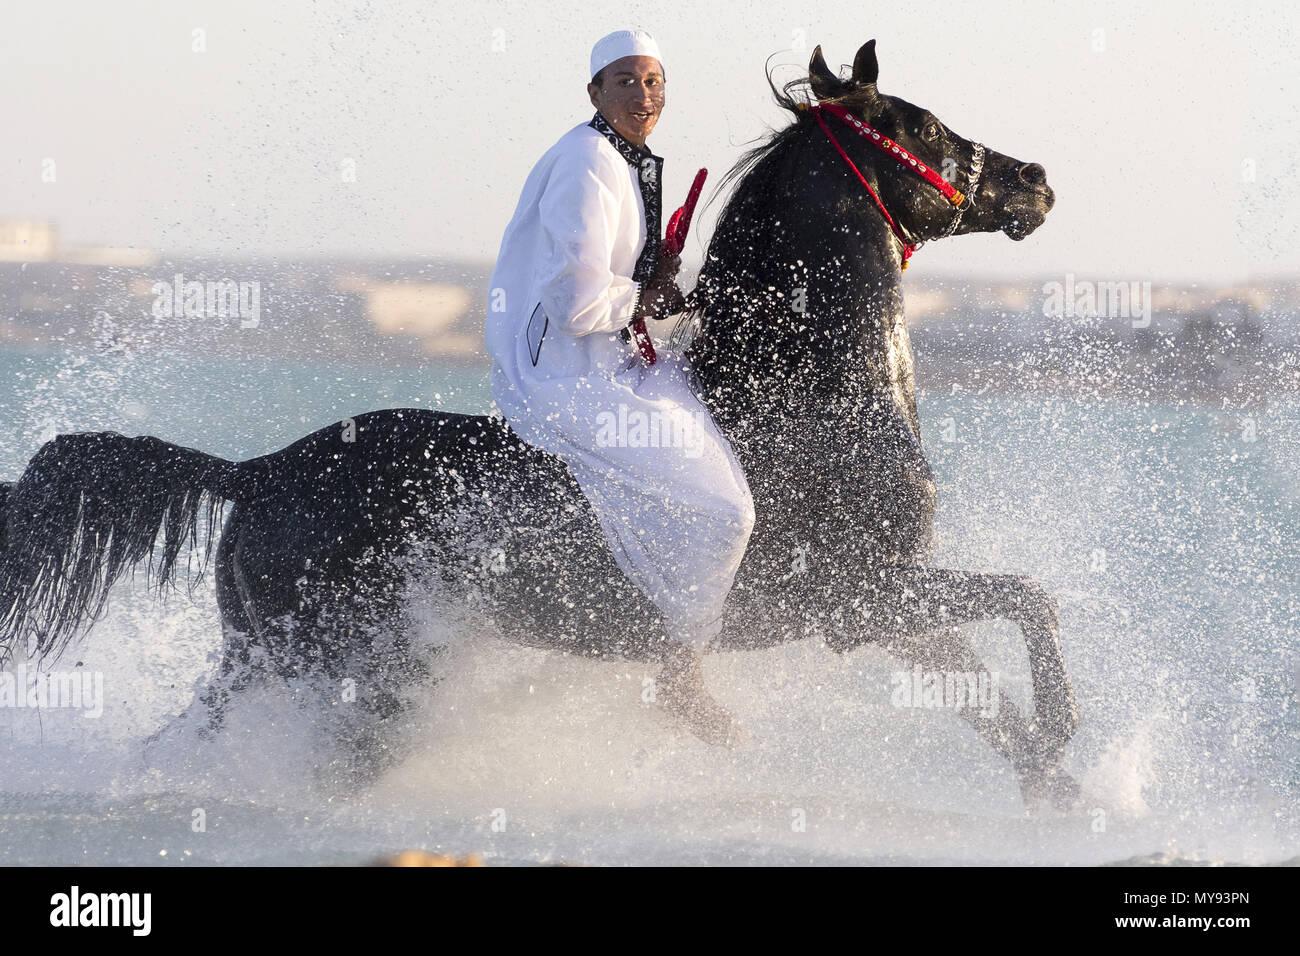 Arabian Horse. Sobre negro semental jinete galopando en aguas poco profundas. Egipto Foto de stock